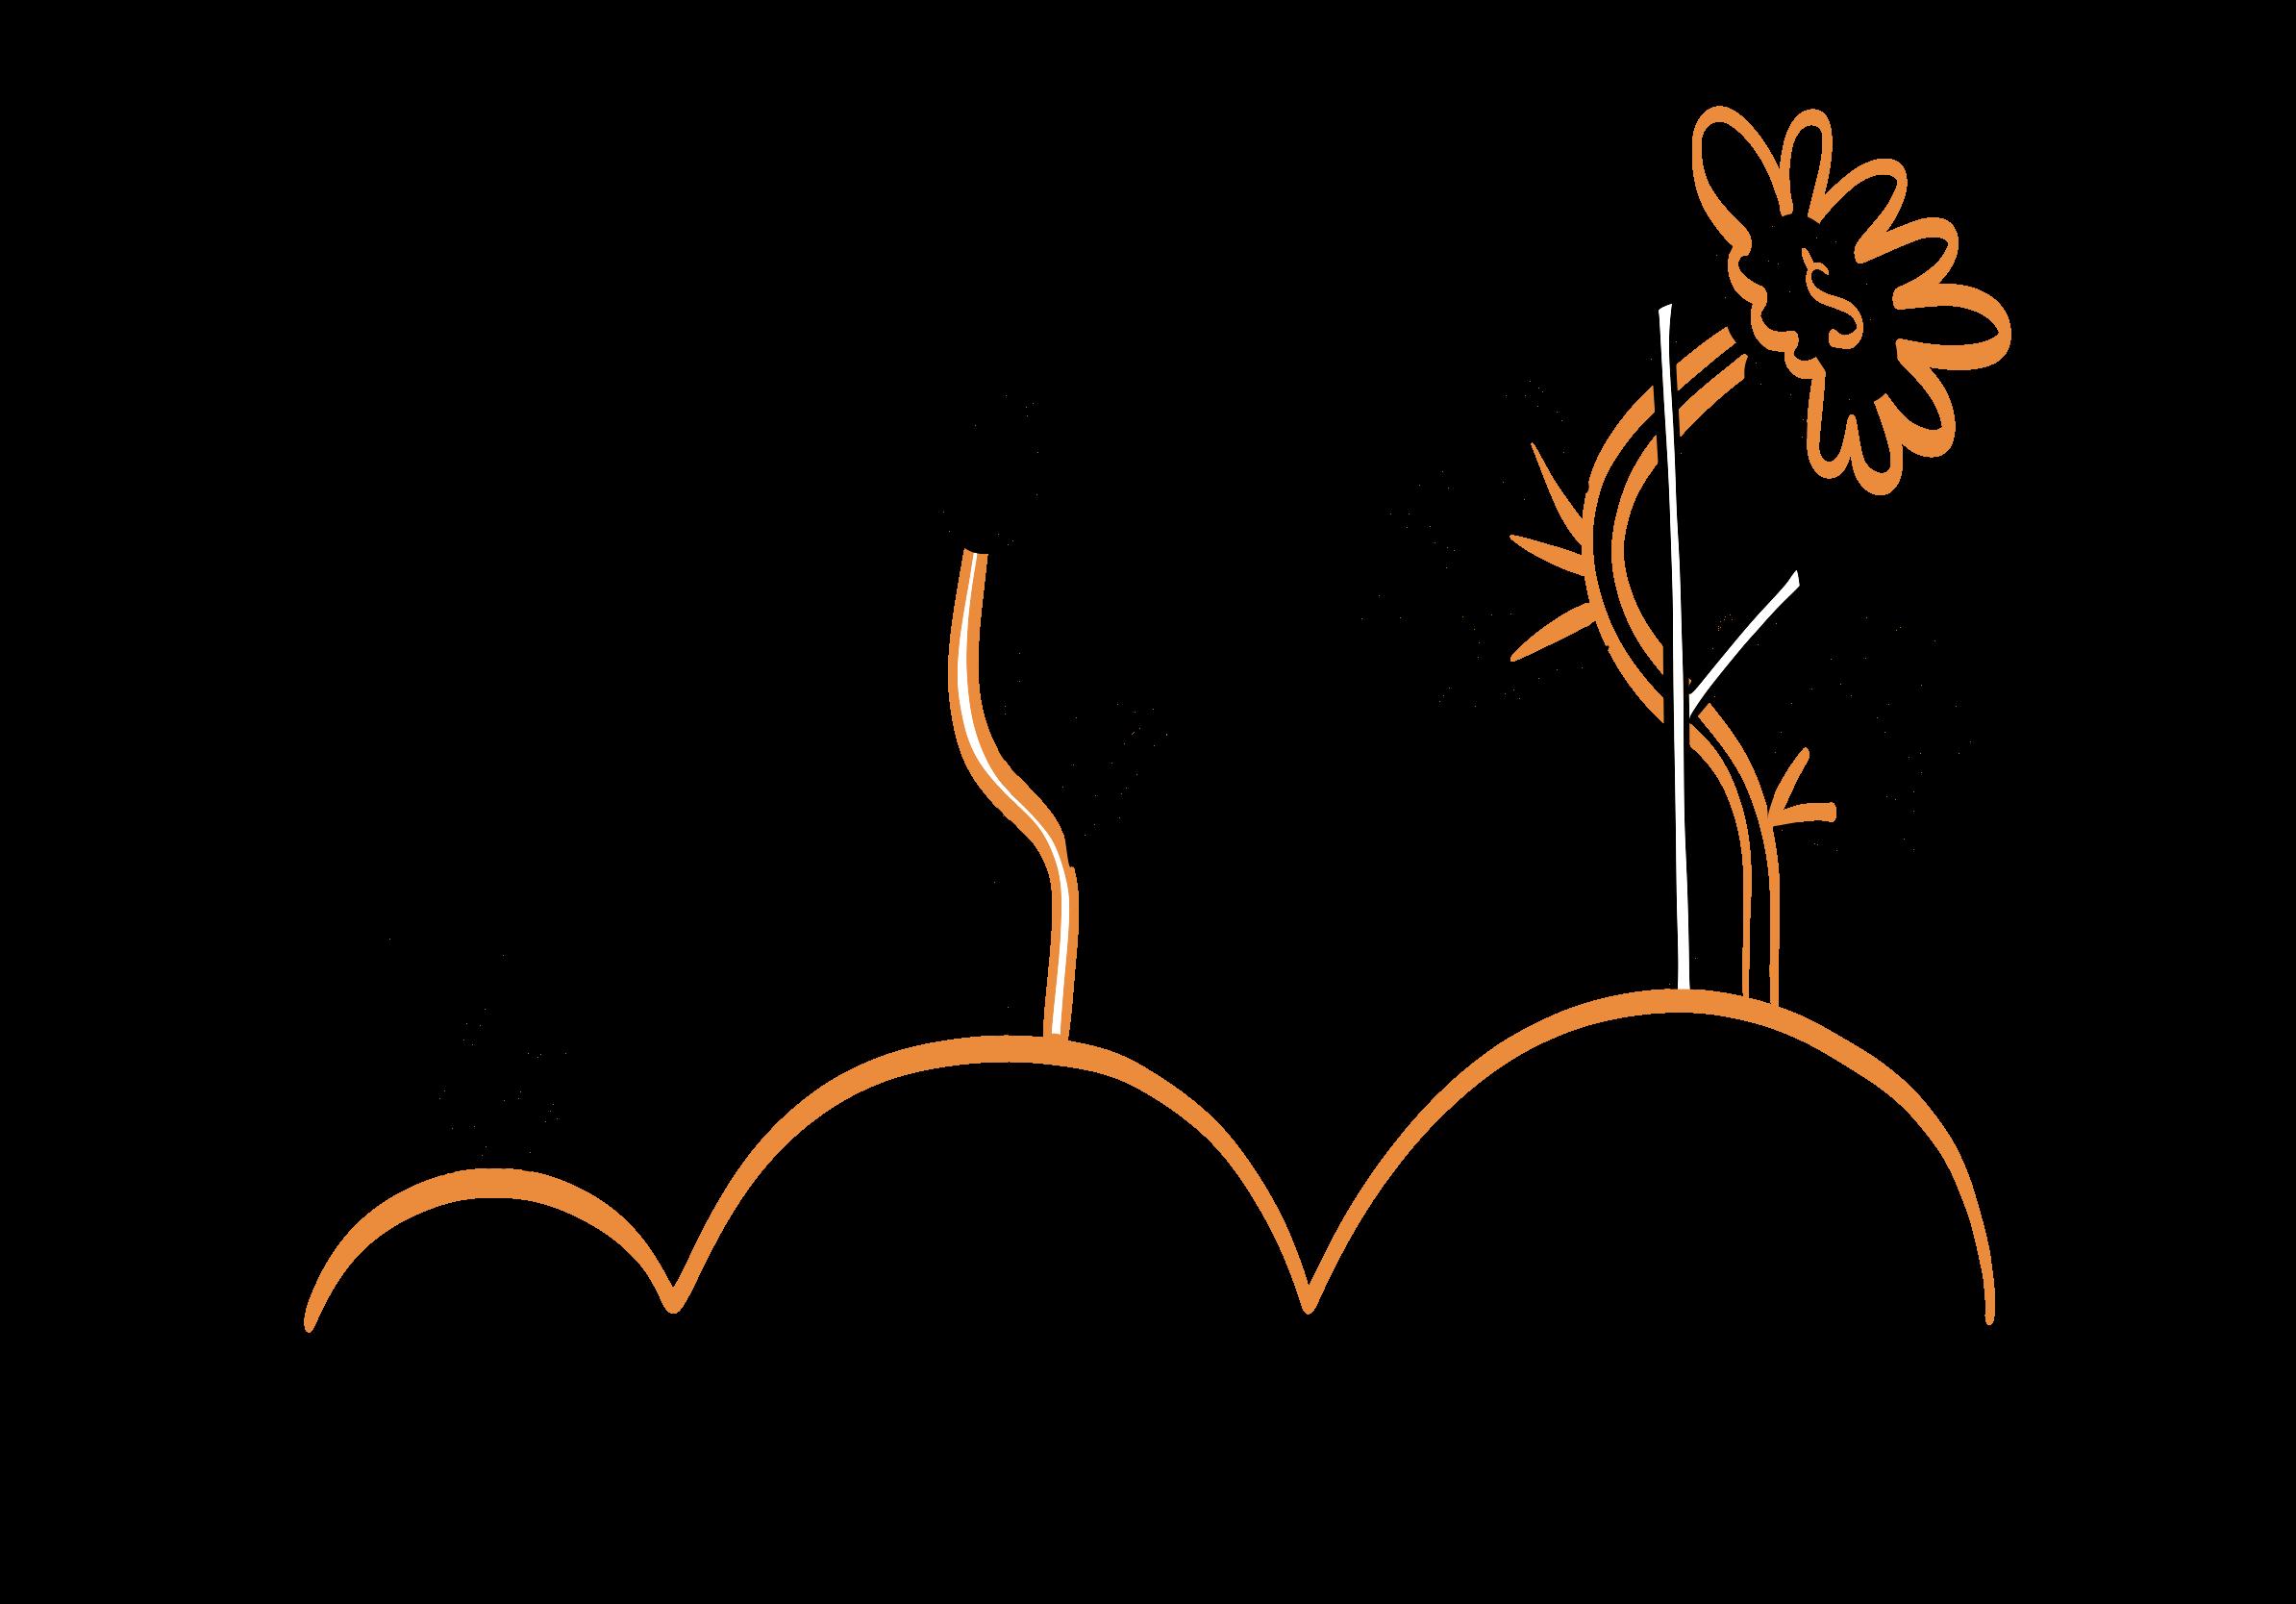 [foundkit]-[web illustration]-[sketches] 9